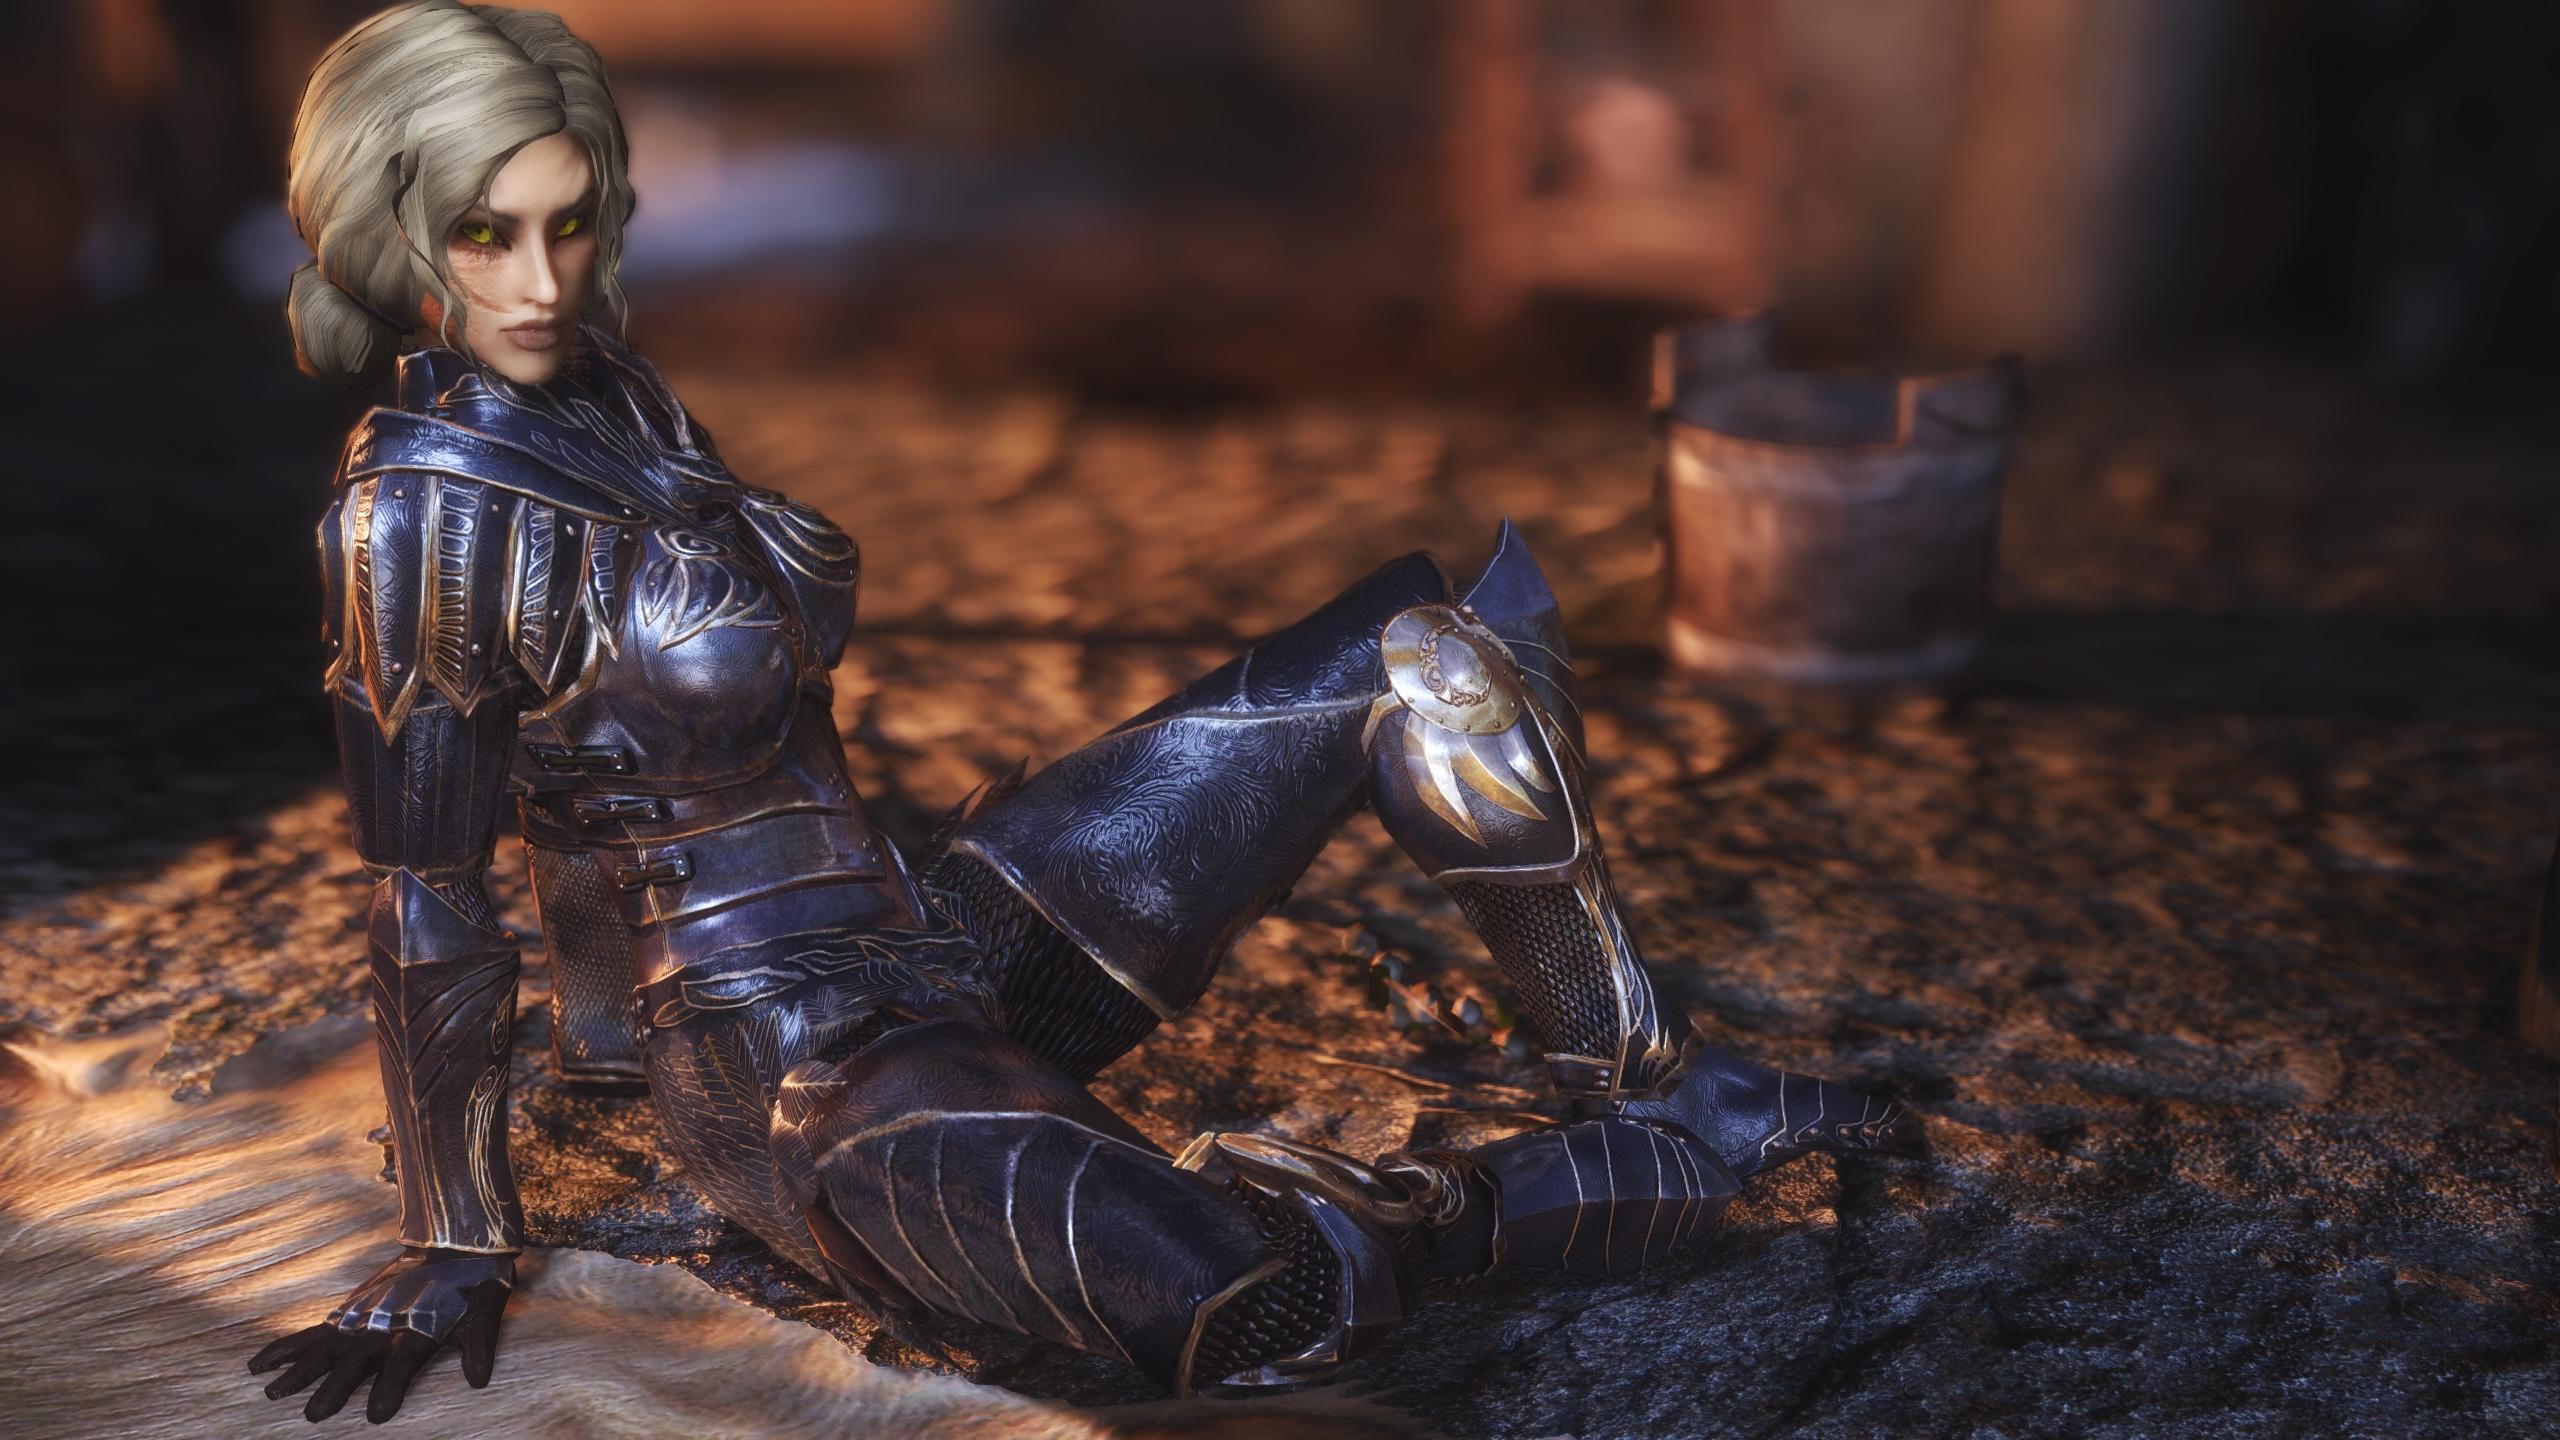 Truly Light Elven Armor